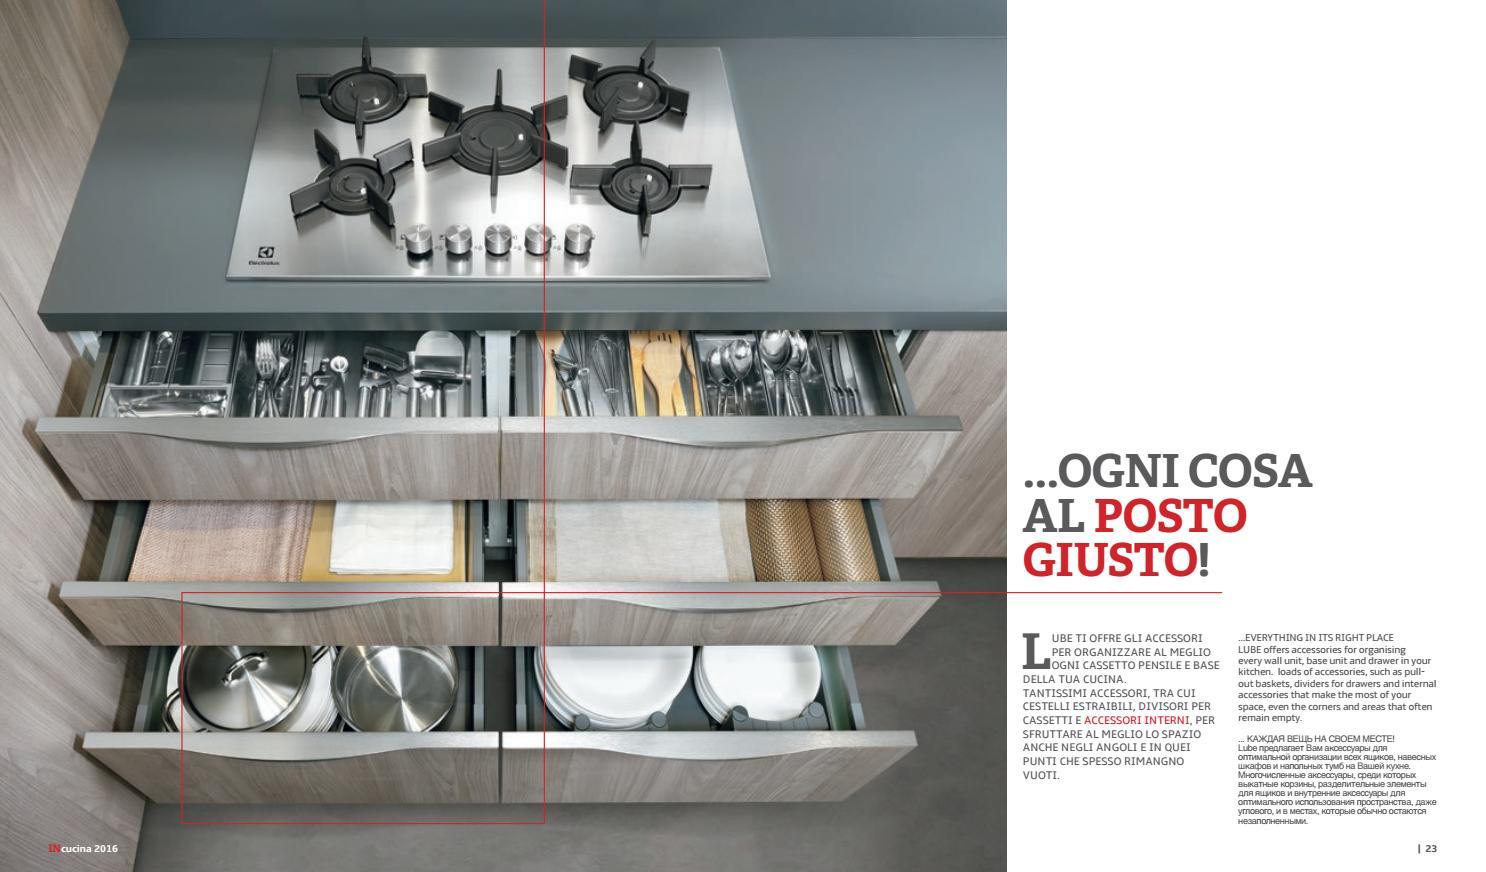 Catalogo in cucina lube treviso by Cucine Lube Treviso - issuu